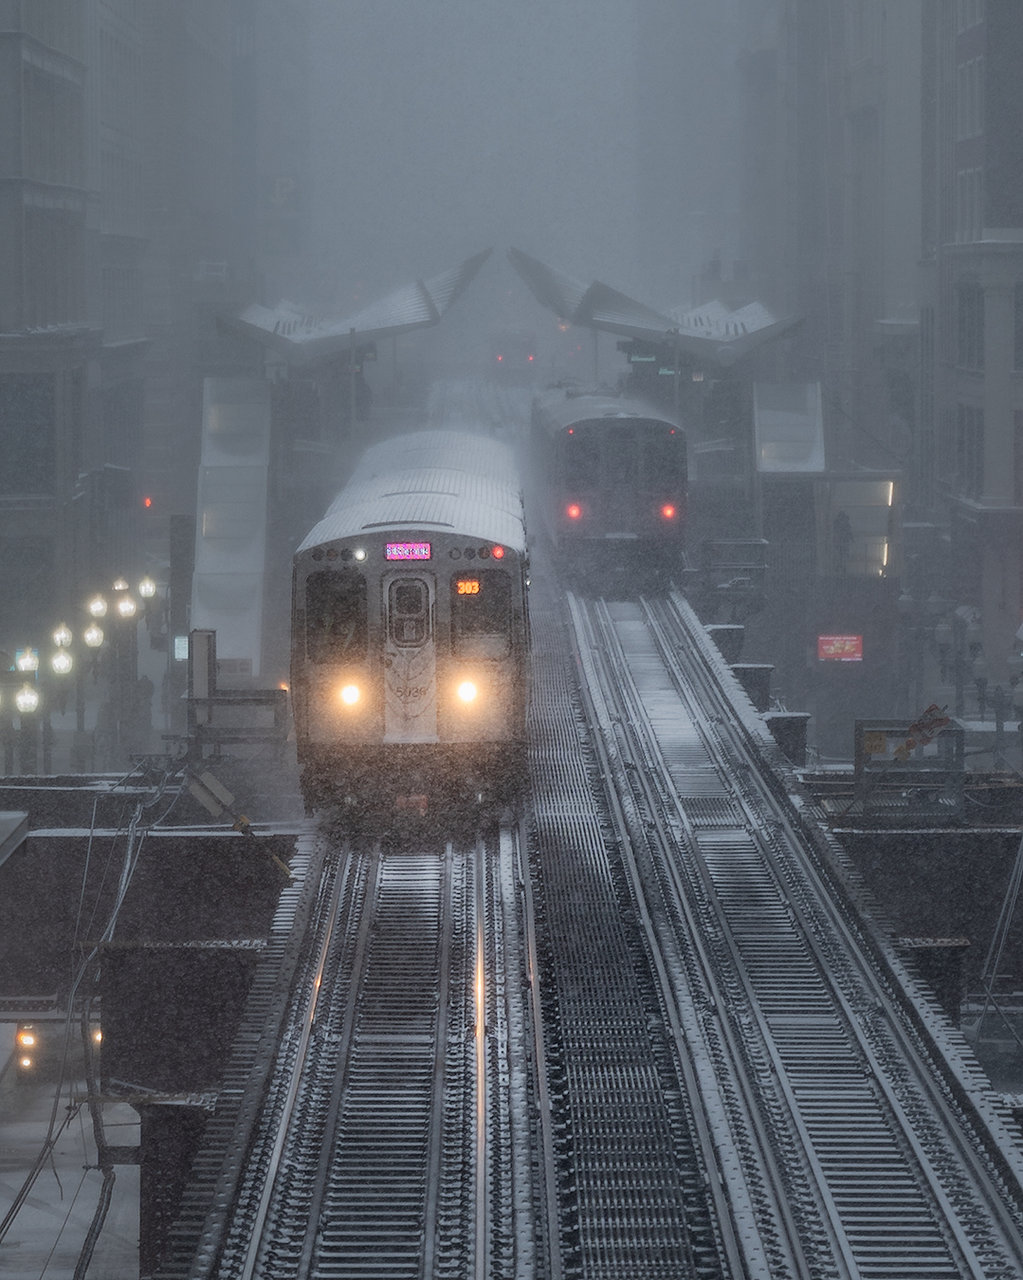 Winter is coming | Author Remo Daut - wallburn | PHOTO FORUM